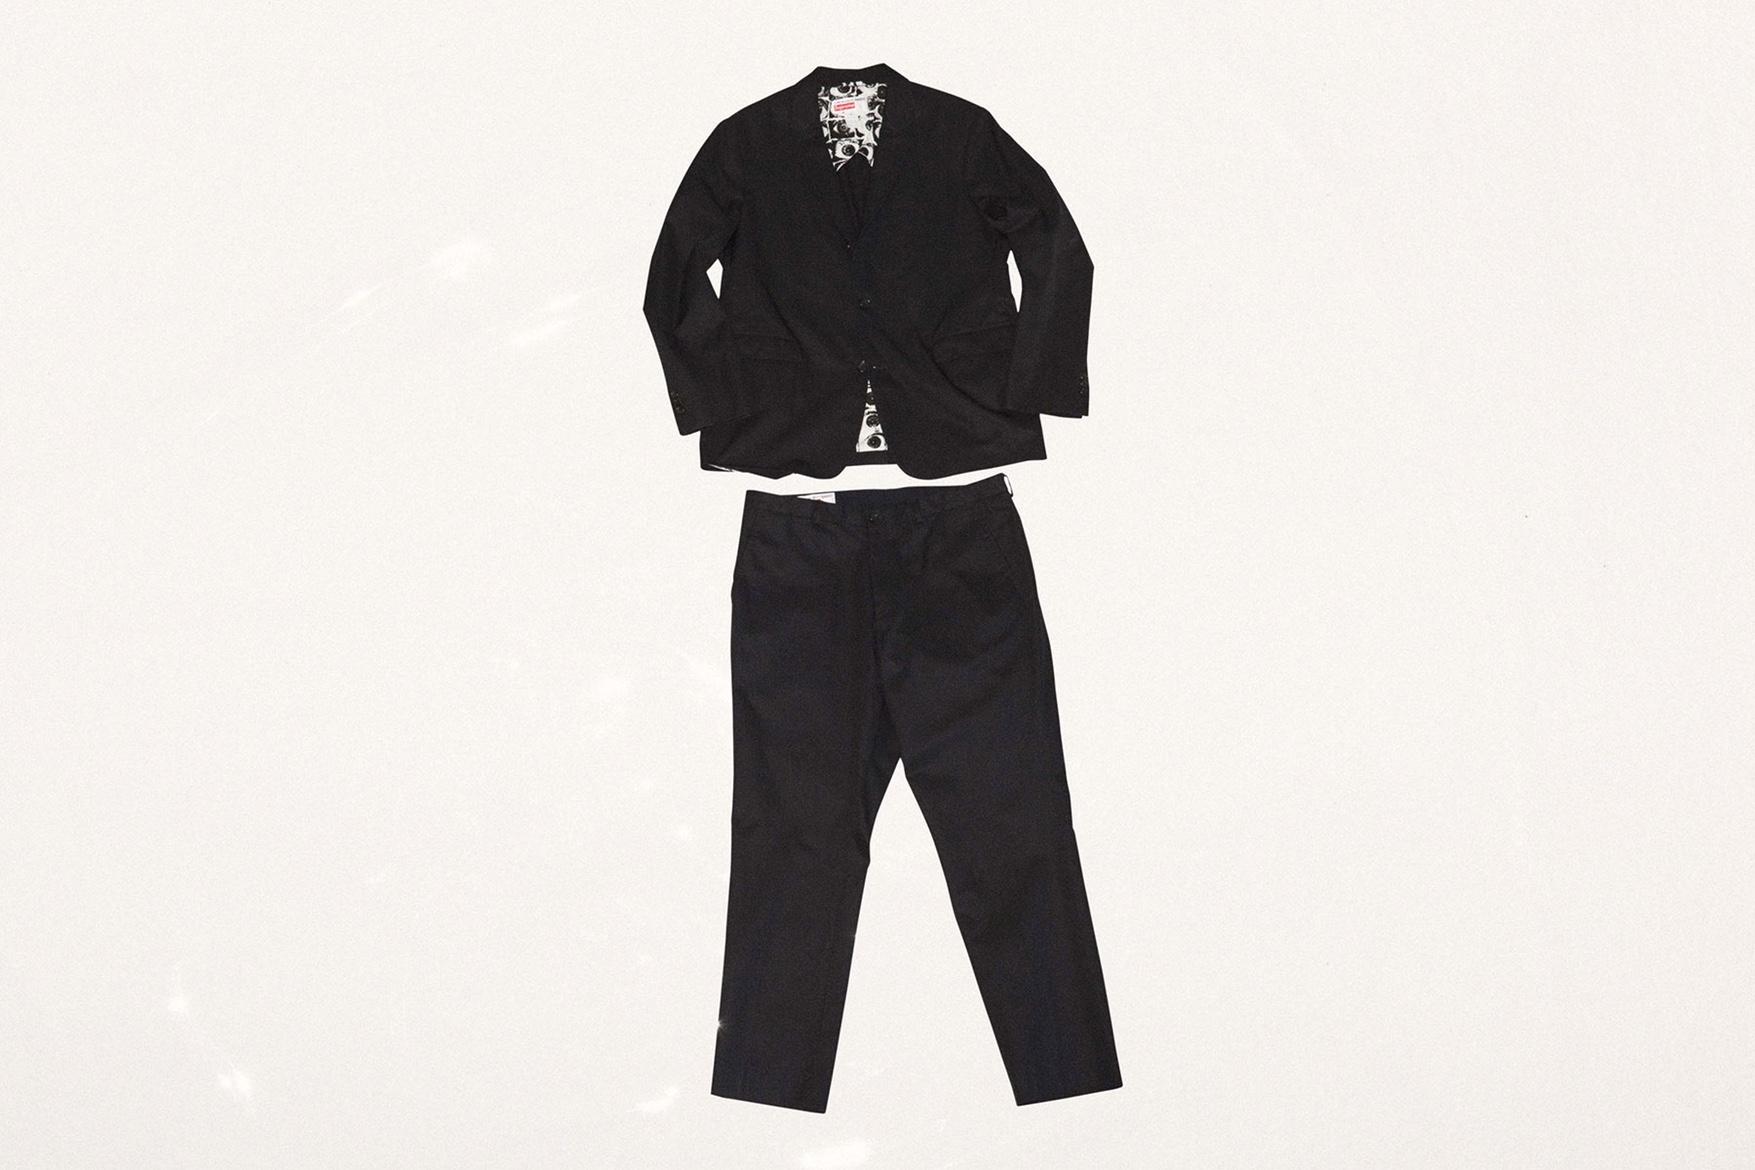 http---hypebeast.com-image-2017-04-supreme-comme-des-garcons-shirt-2017-spring-summer-collection-black-gabardine-suit-8.jpg